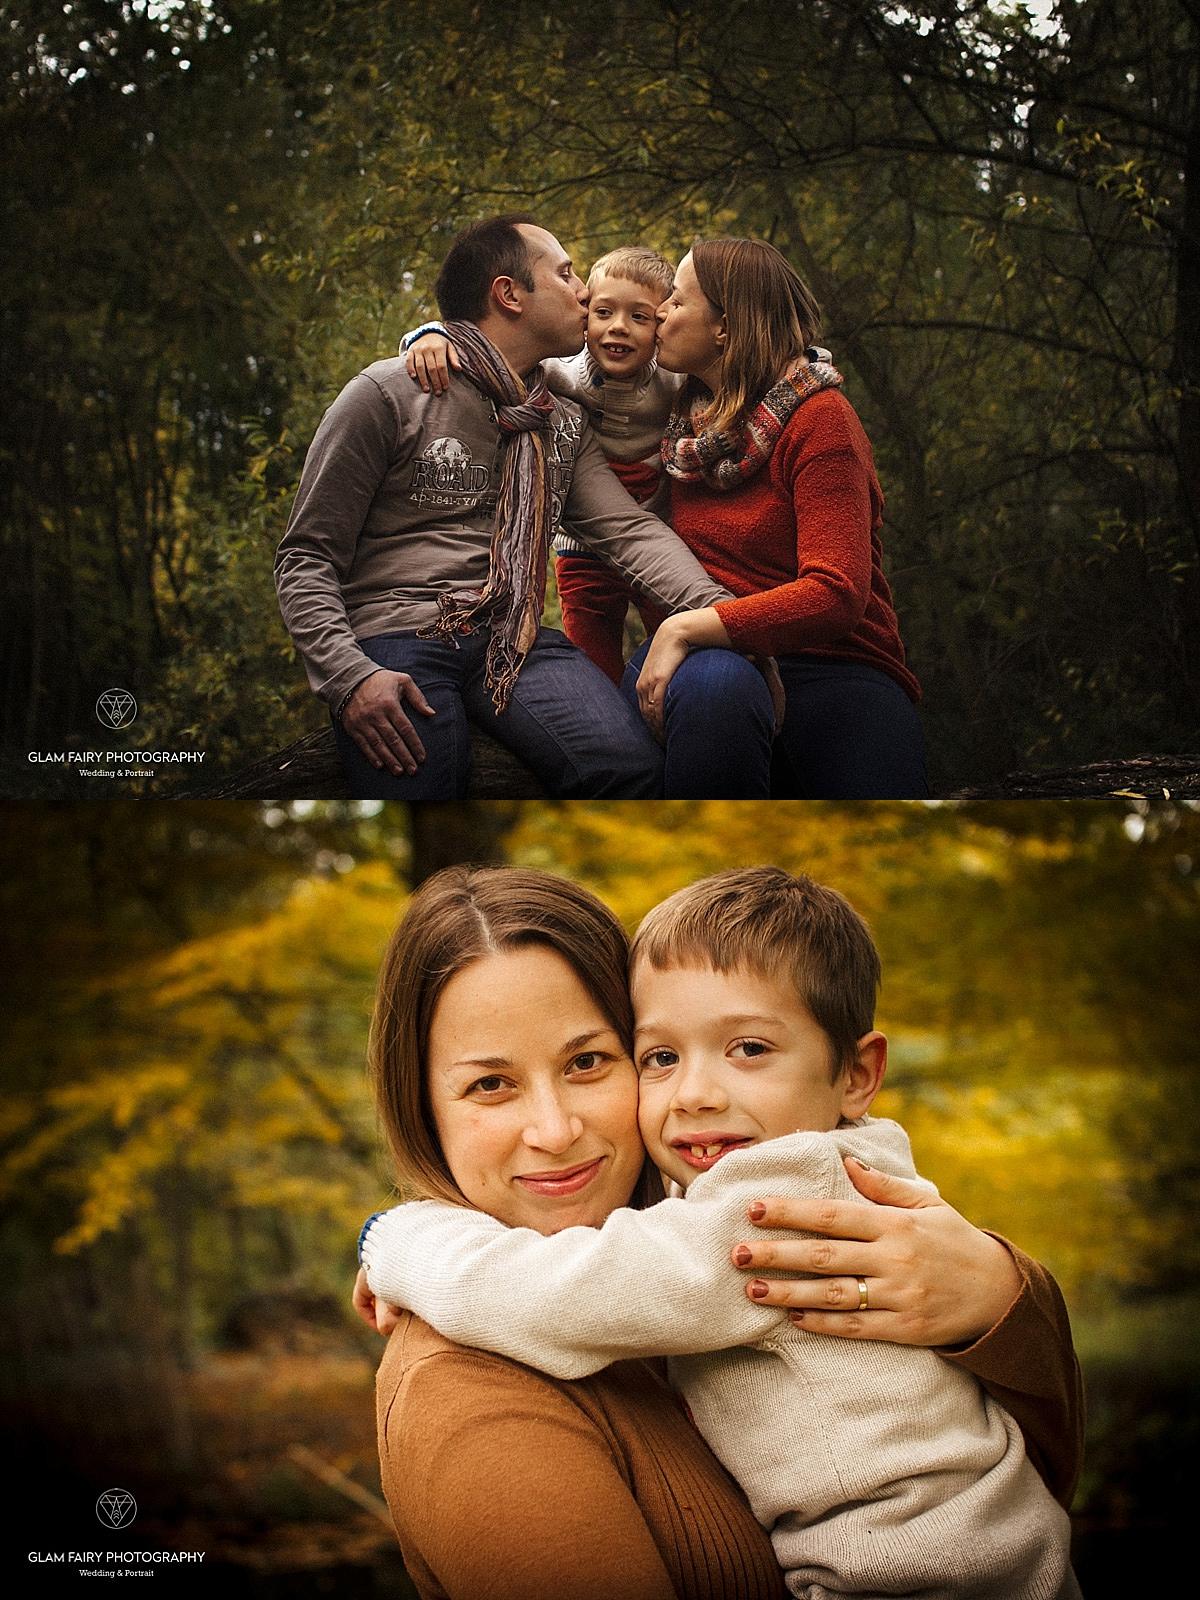 GlamFairyPhotography-mini-session-en-famille-a-vincennes-cecile_0005